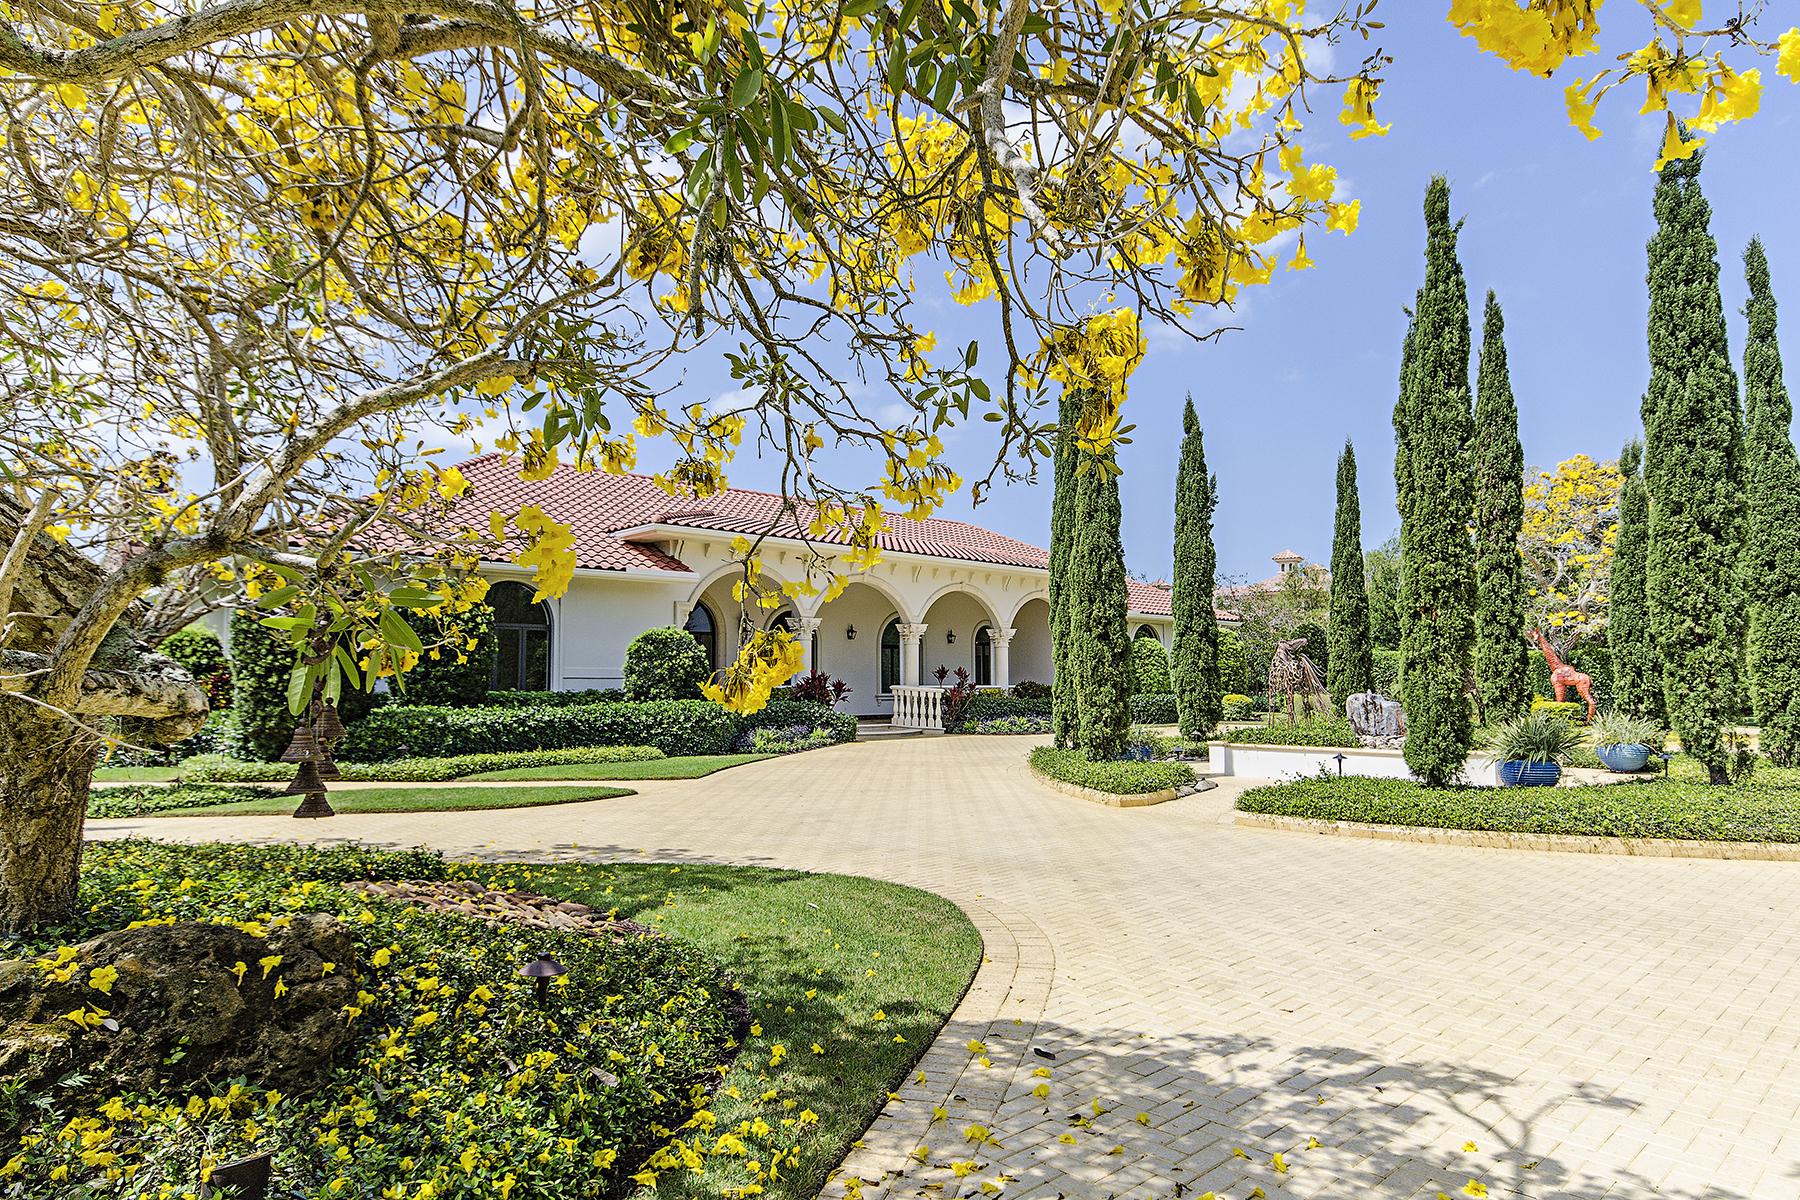 Single Family Home for Sale at 196 Eugenia Dr , Naples, FL 34108 196 Eugenia Dr Naples, Florida, 34108 United States